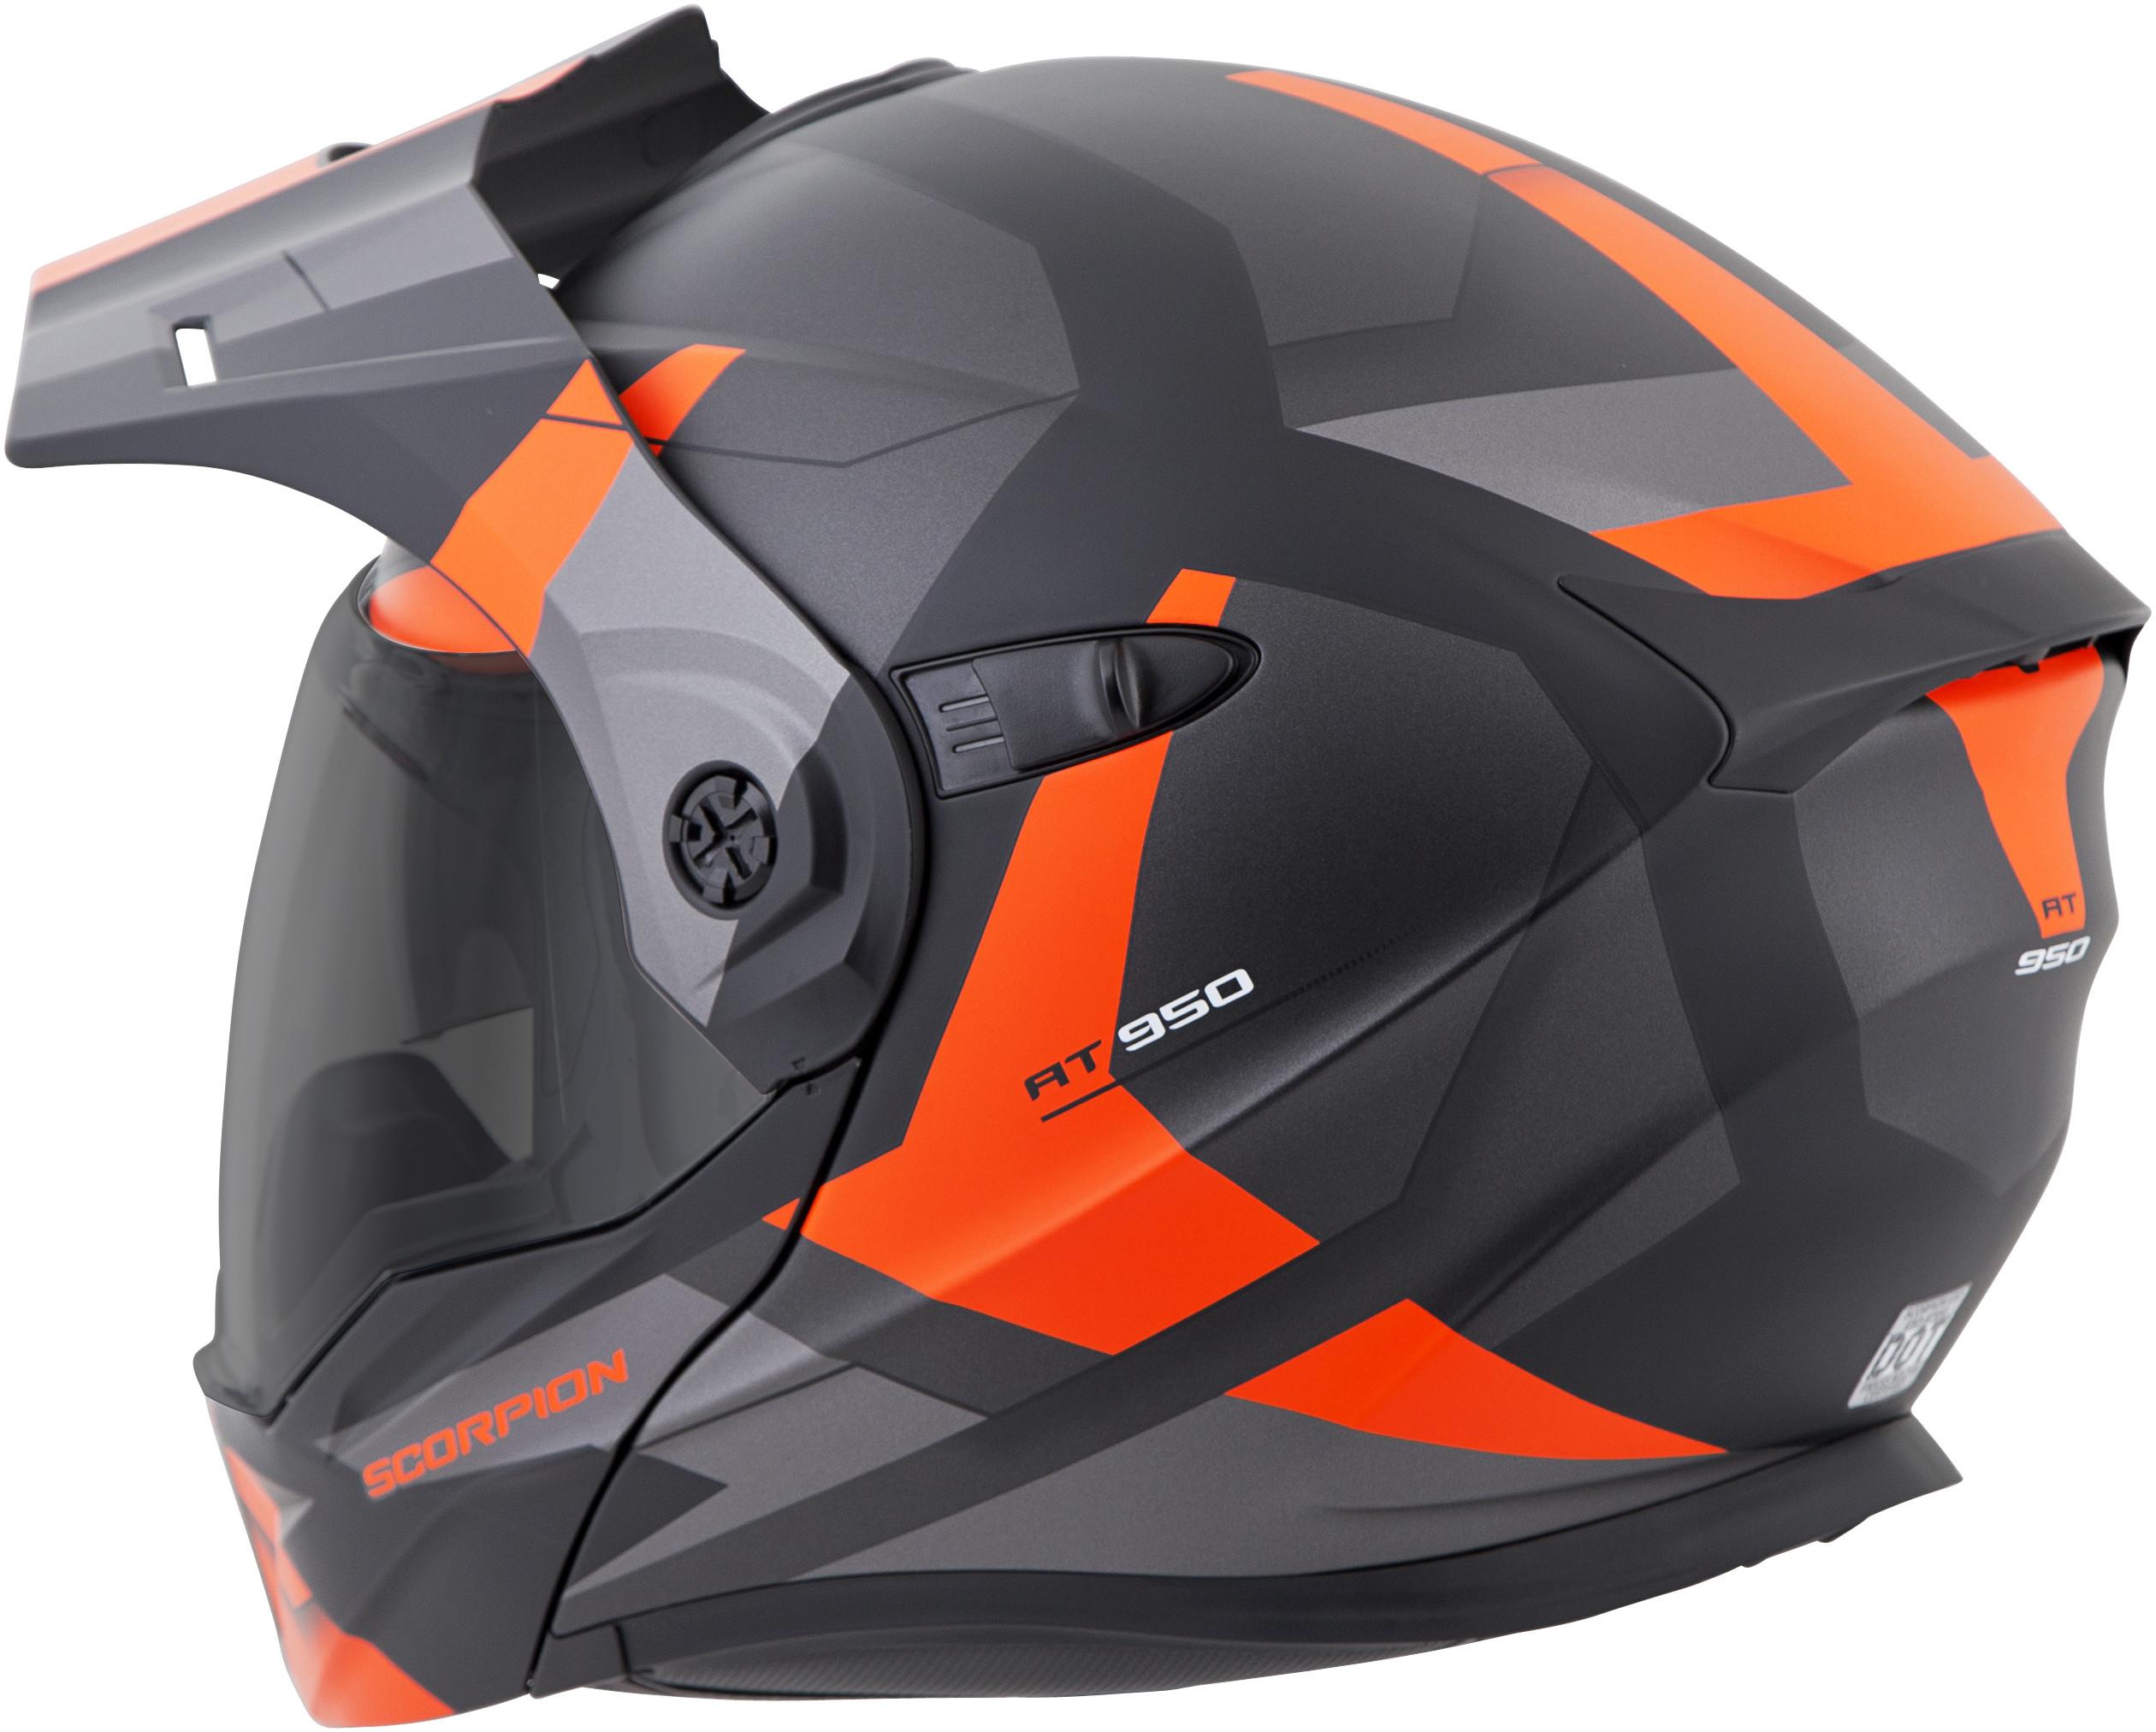 for-Scorpion-Helmet-EXO-AT950-Neocon-Snow-Helmet-with-Dual-Lens-Shield miniature 20